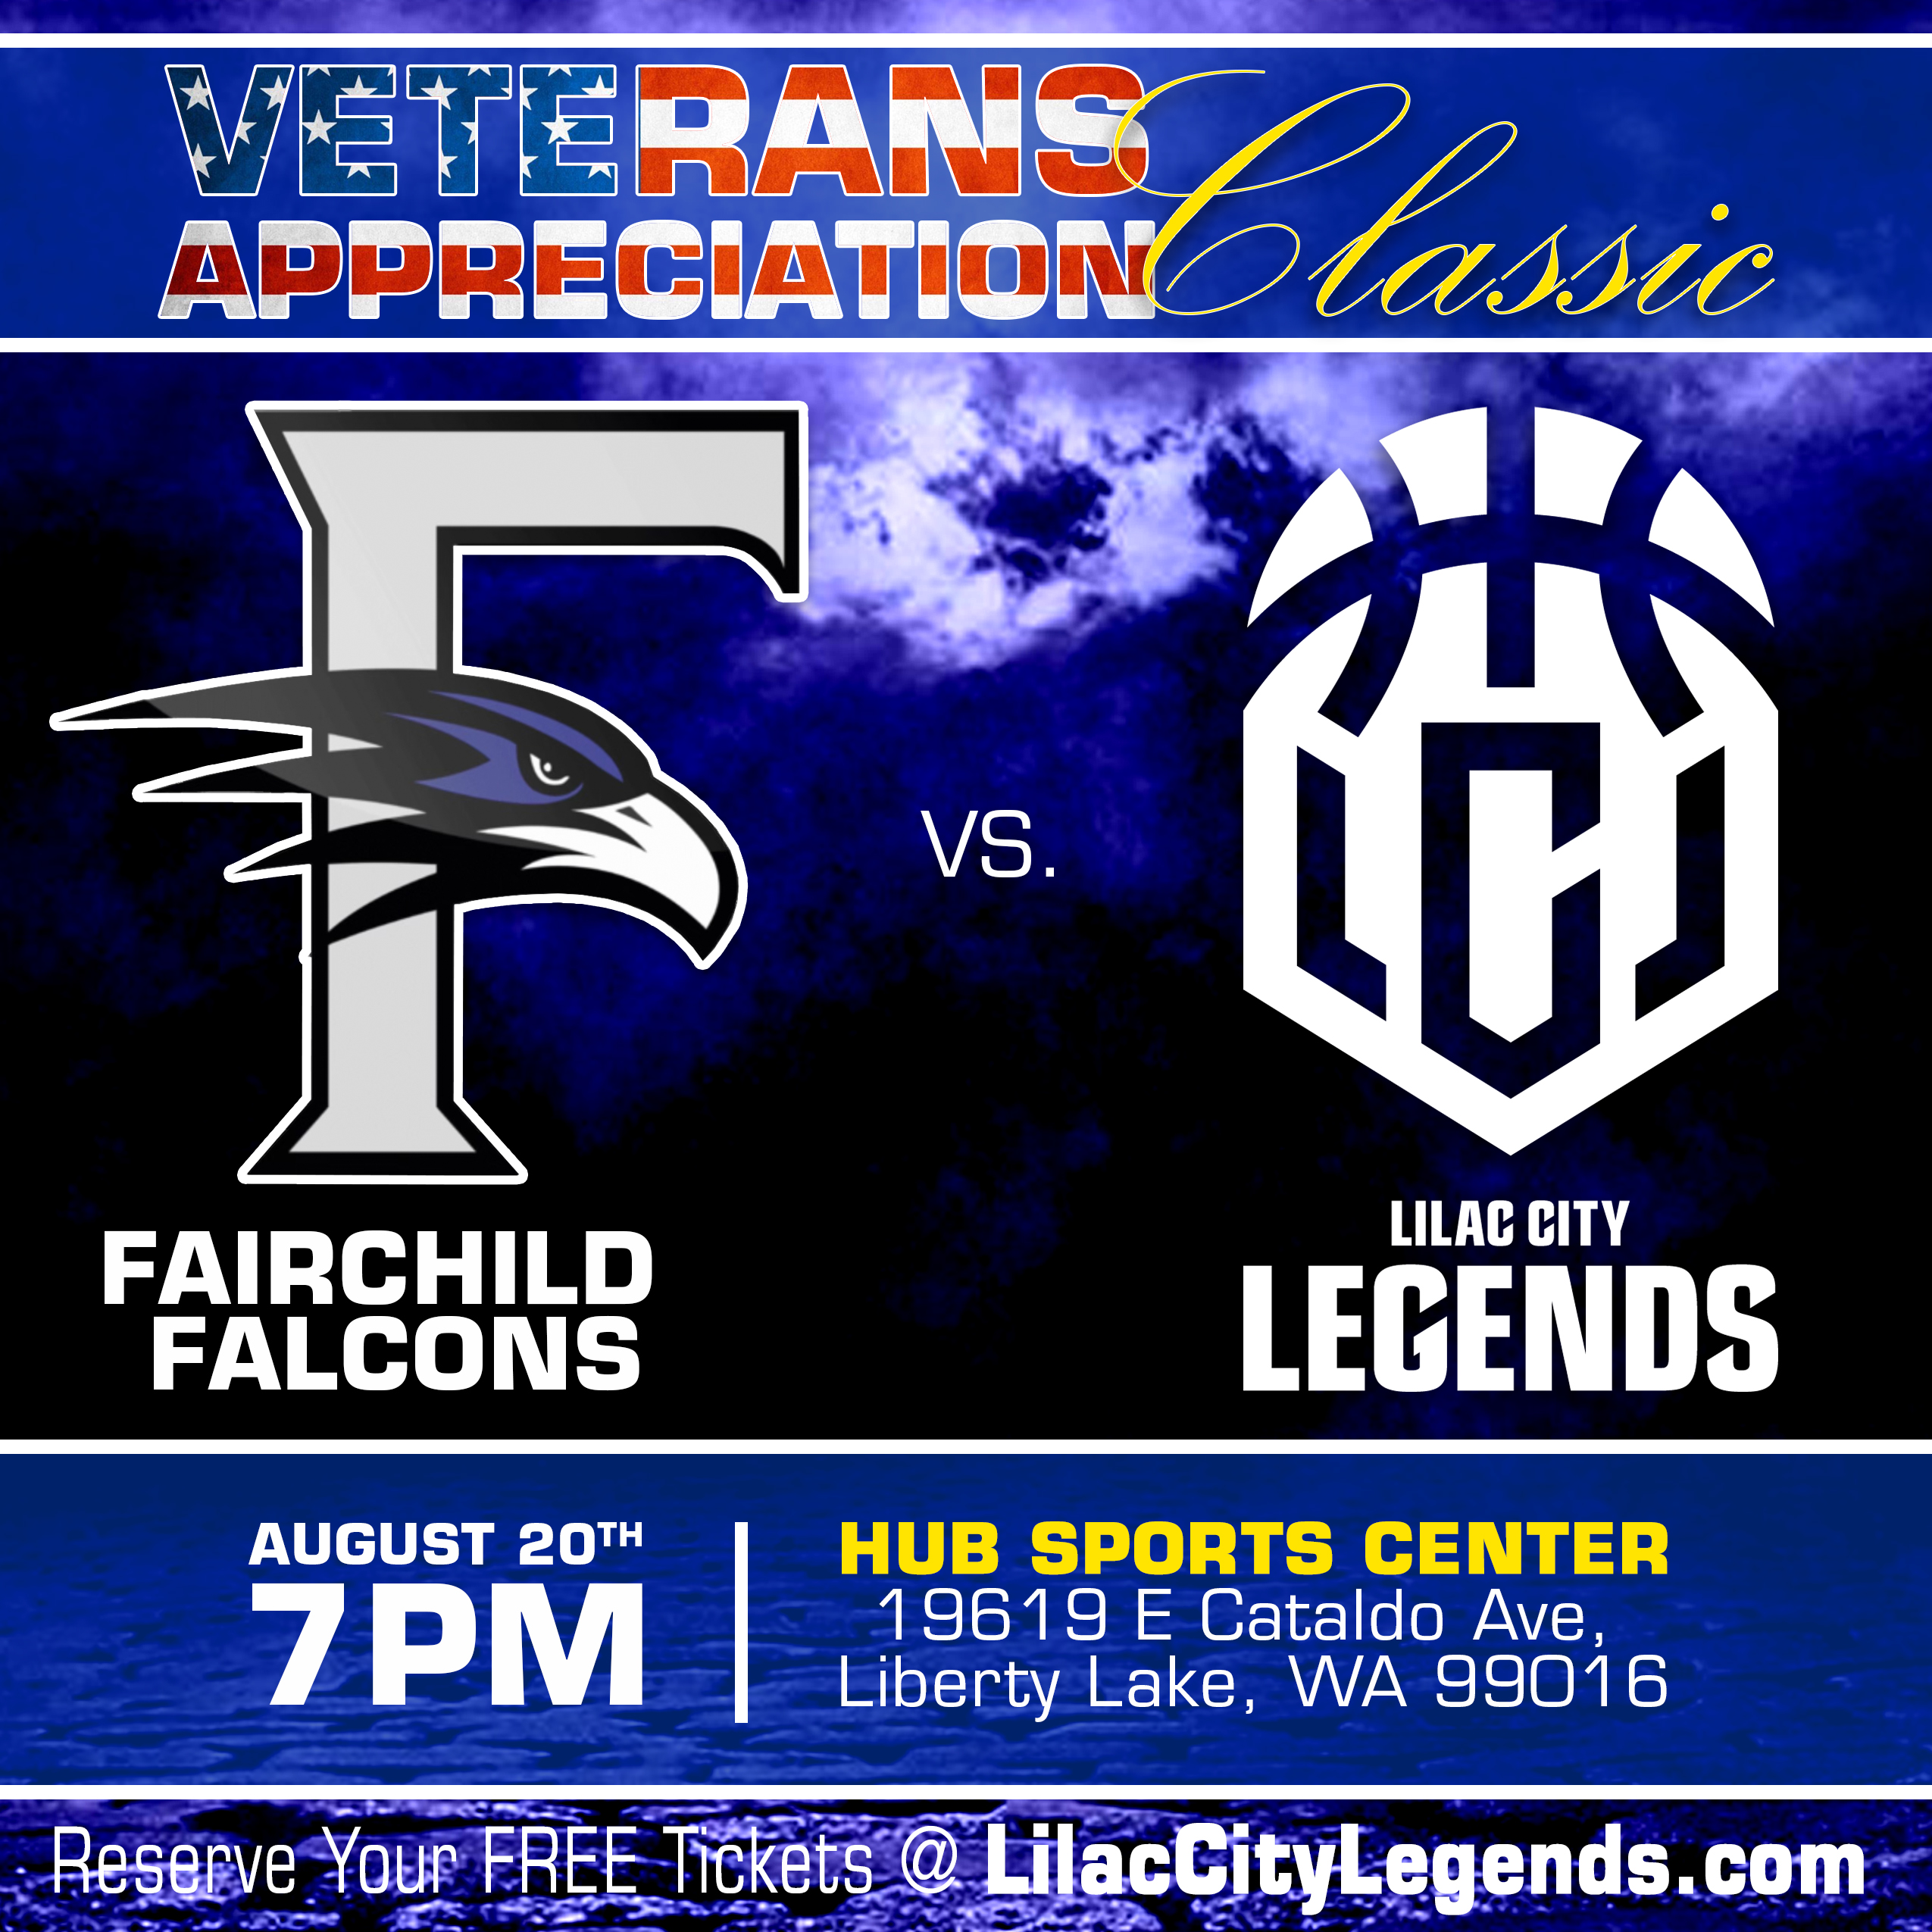 Veteran's Appreciation Classic | Fairchild Falcons vs. Lilac City Legends | August 20th 7 PM | HUB Stports Center 19619 E Cataldo Ave Liberty Lake , WA 99016 | Reserve Your FREE Tickets at LilacCityLegends.com